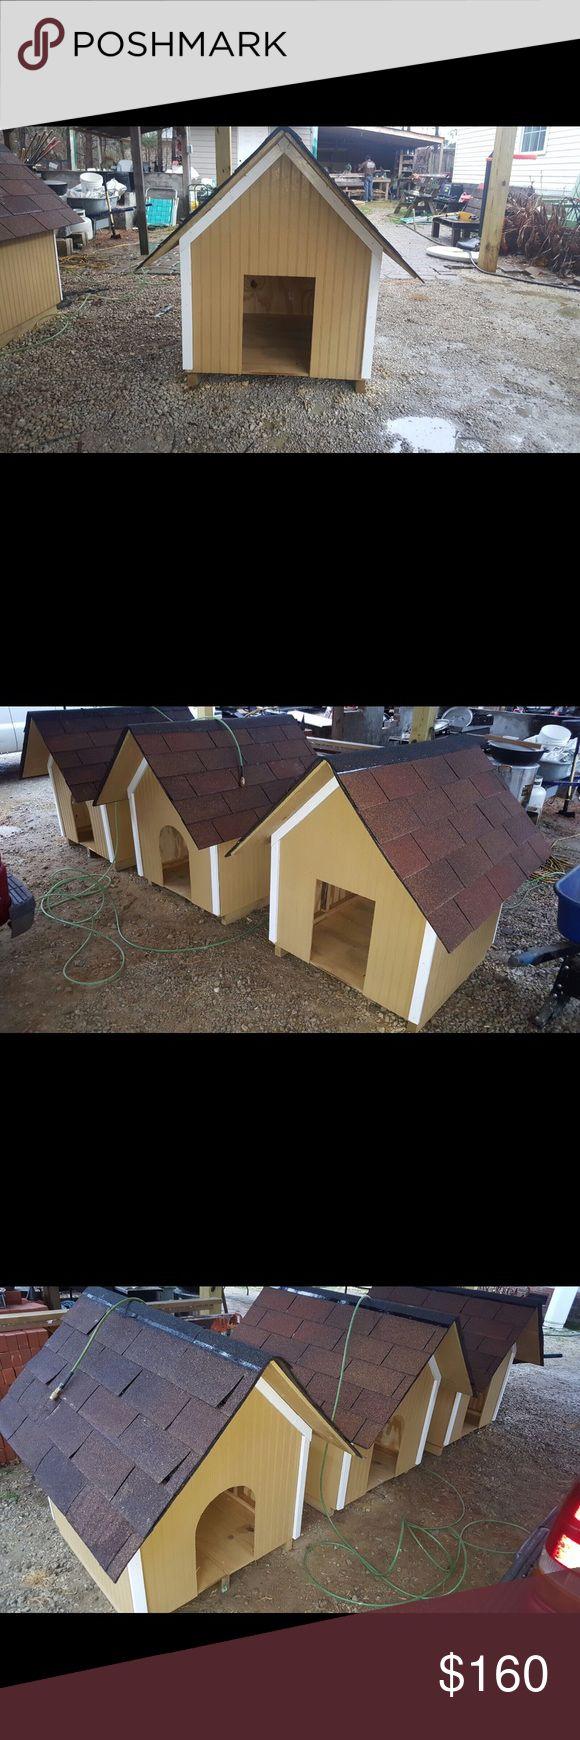 "Dog Houses Newly Built  •32""x32"" Houses •45"" Tall •1/2"" treated plywood floors •Treated blocks under house •20 Year shingles  $160 Each Other"